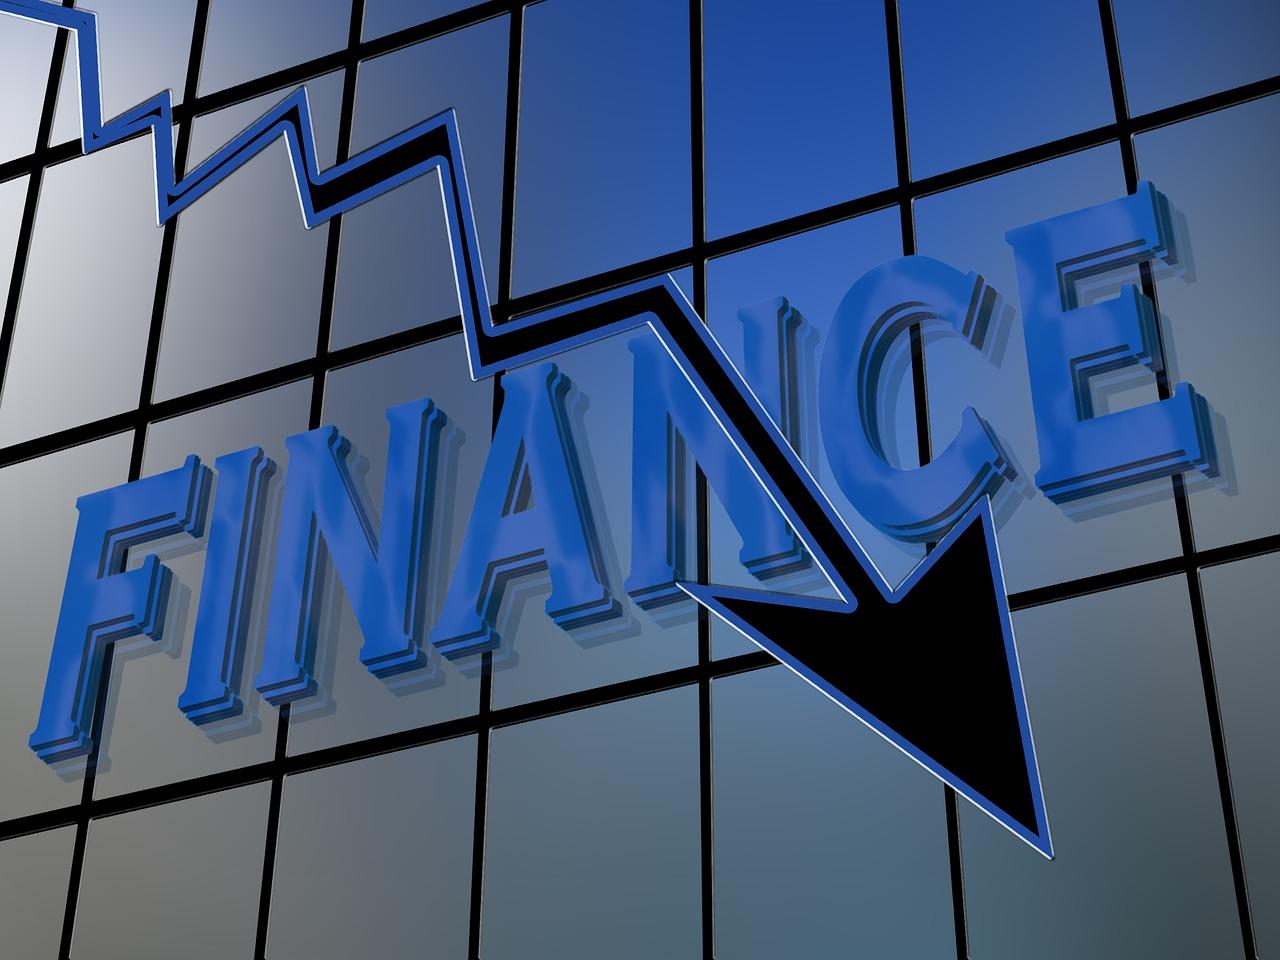 Nigeria Diaspora Remittances Fall By 24% In Q1 2021